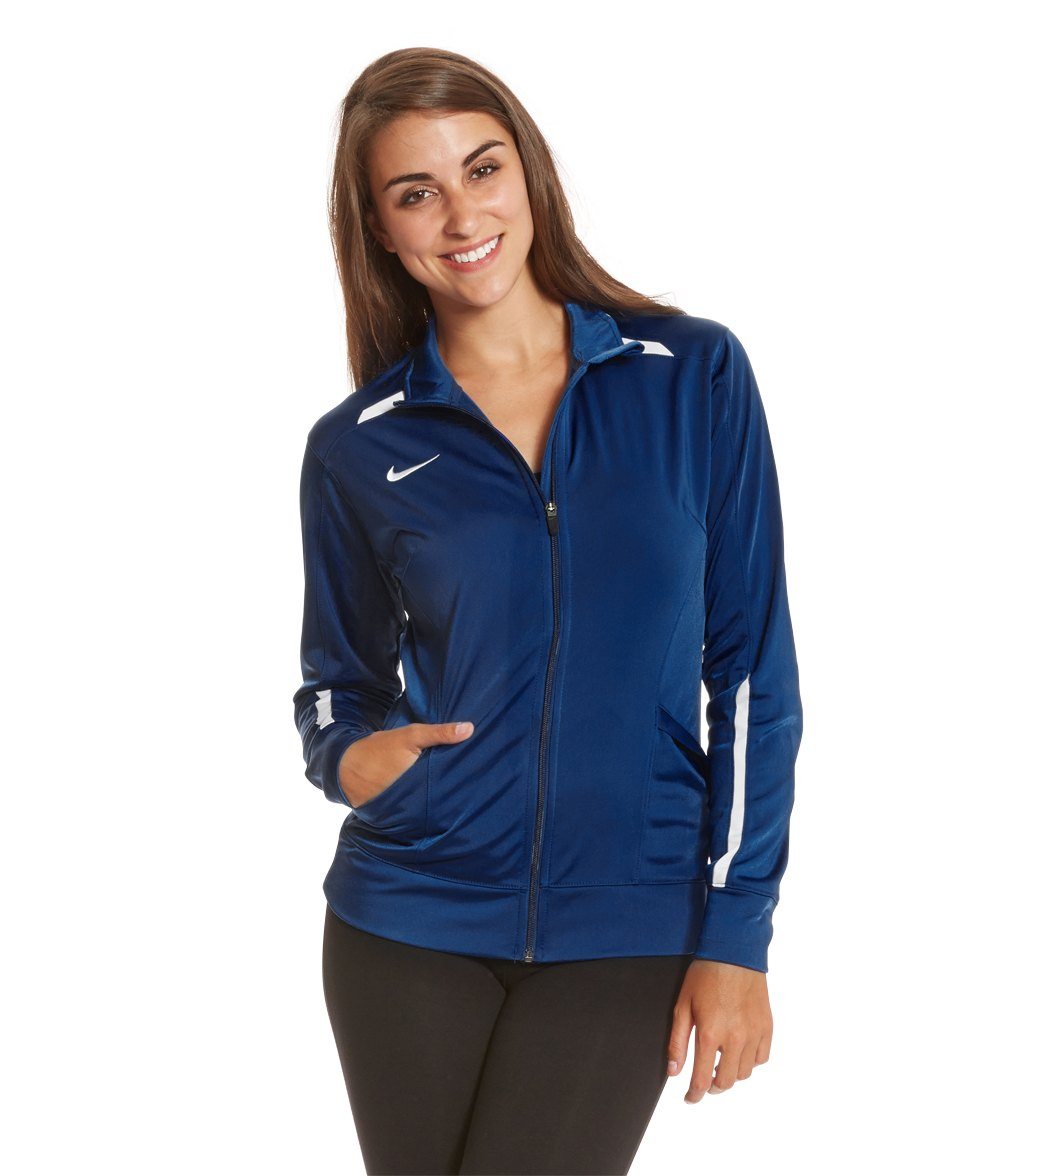 6dea4640f18f Nike Swim Women s Overtime Warm-Up Jacket at SwimOutlet.com ...